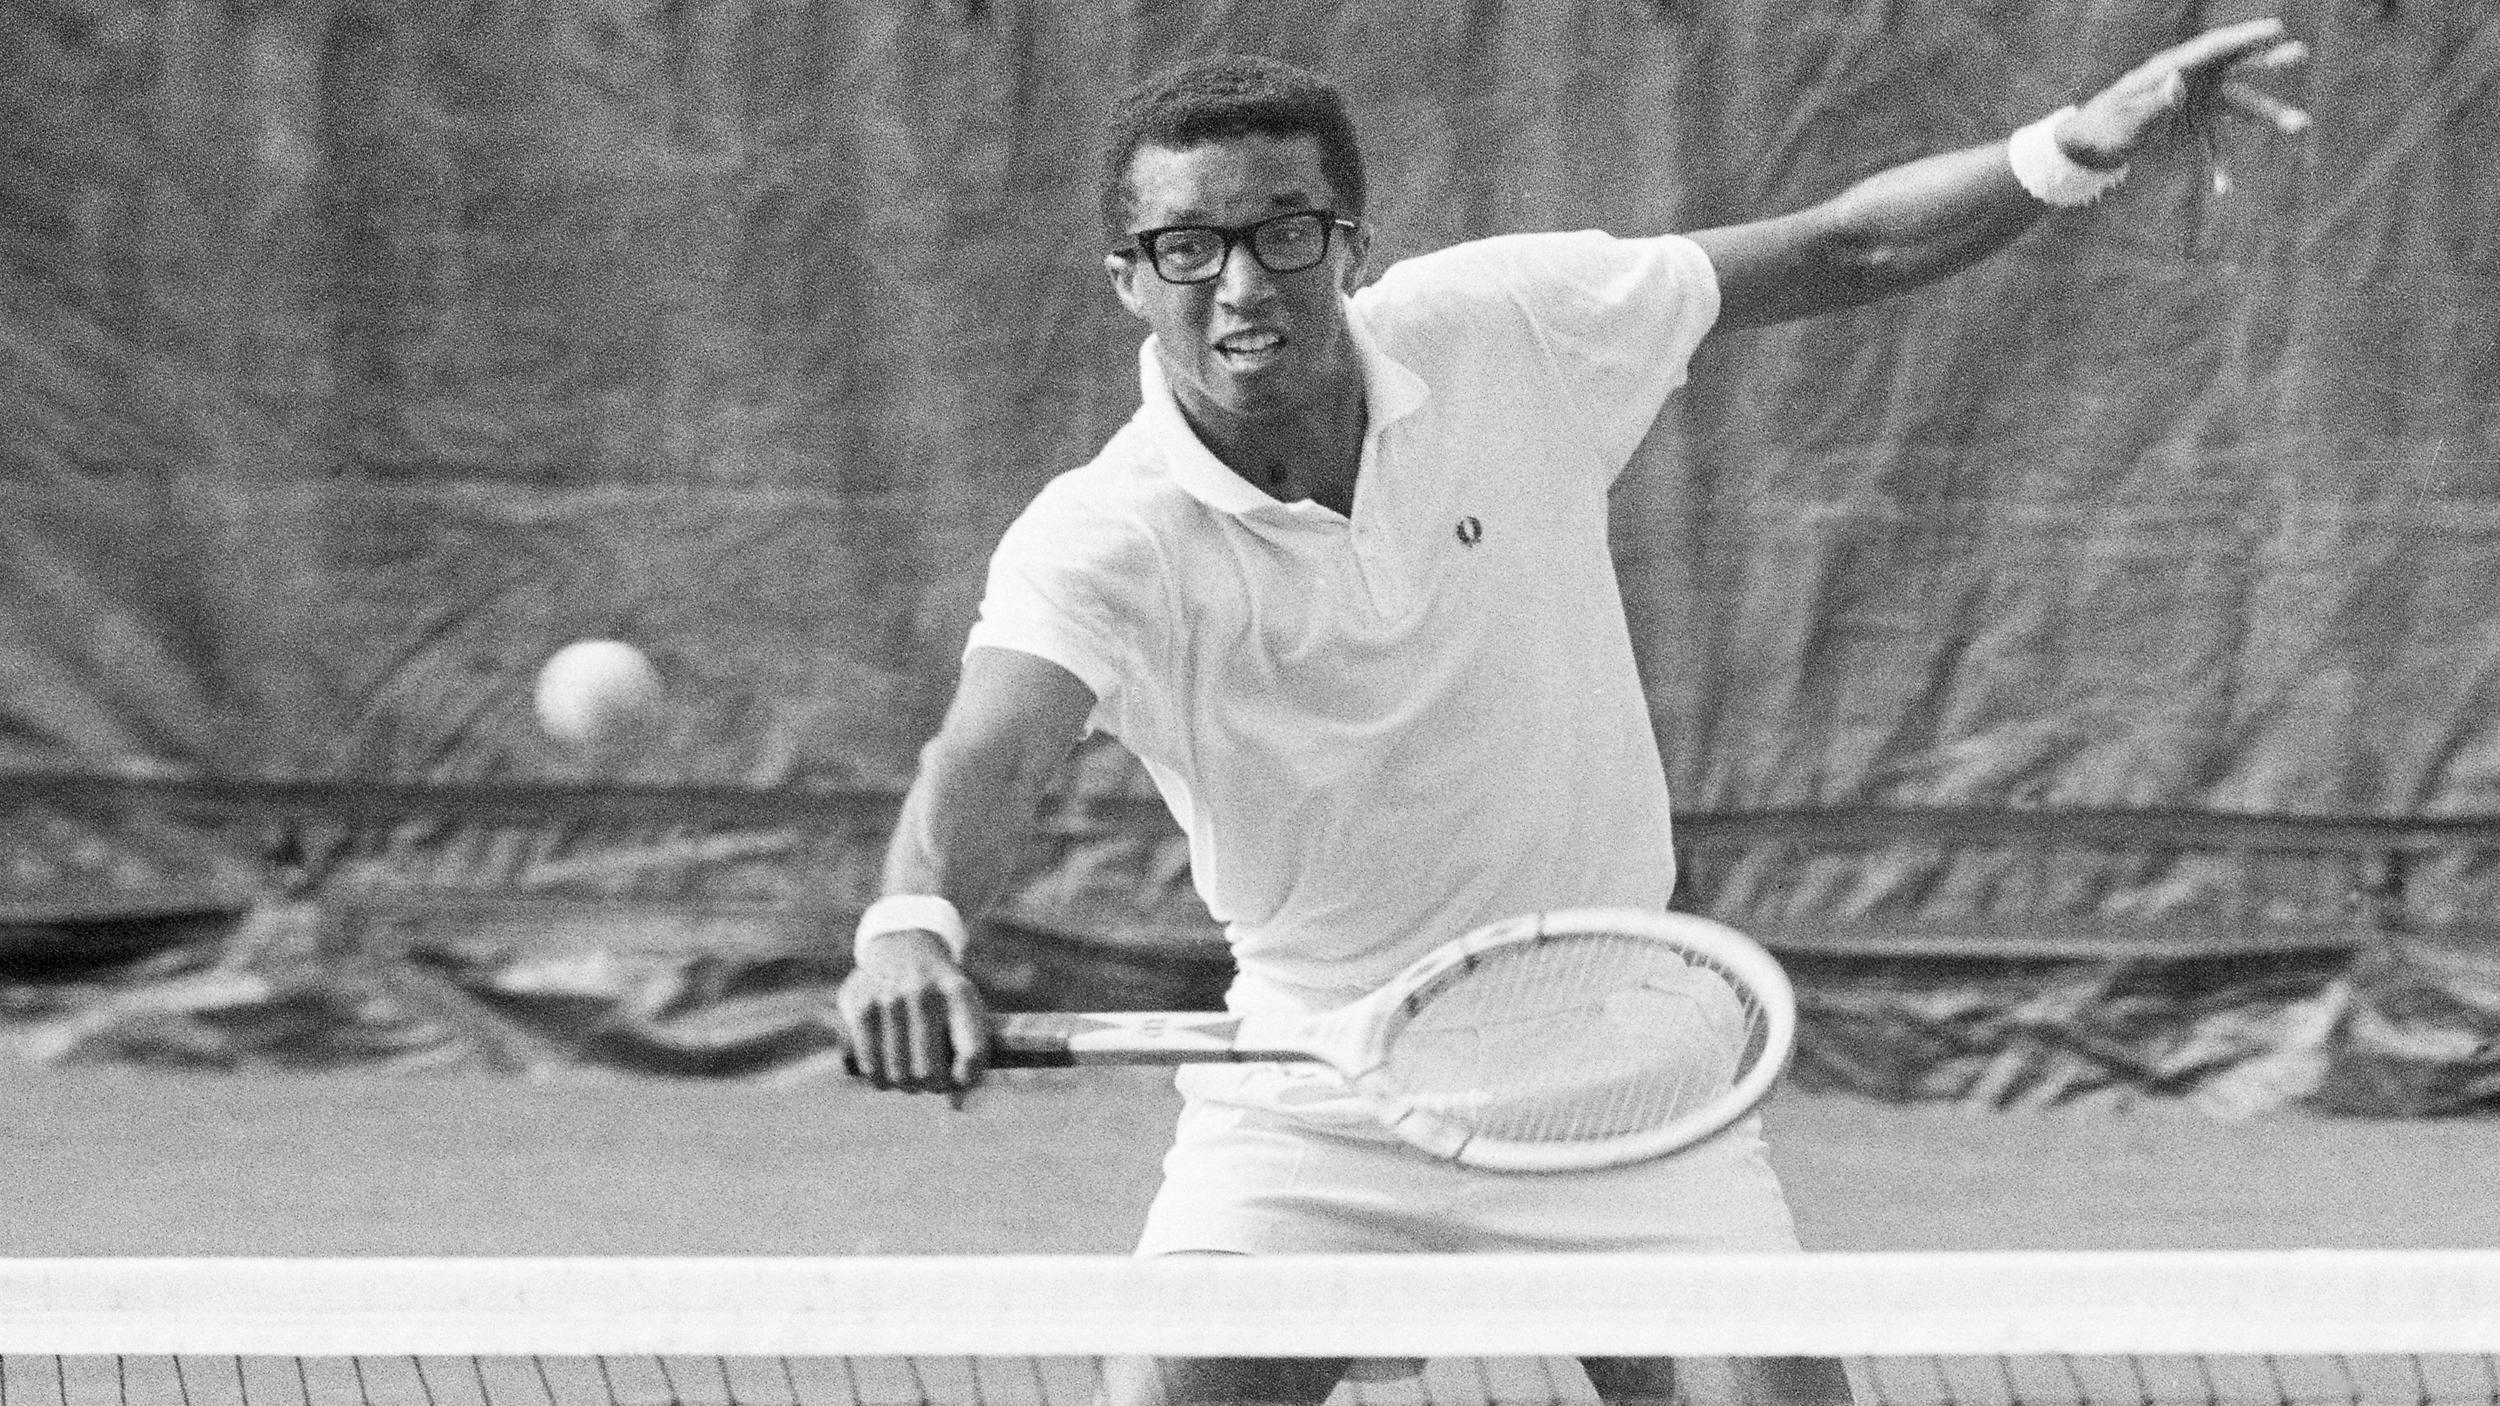 Arthur Ashe on Tennis Court